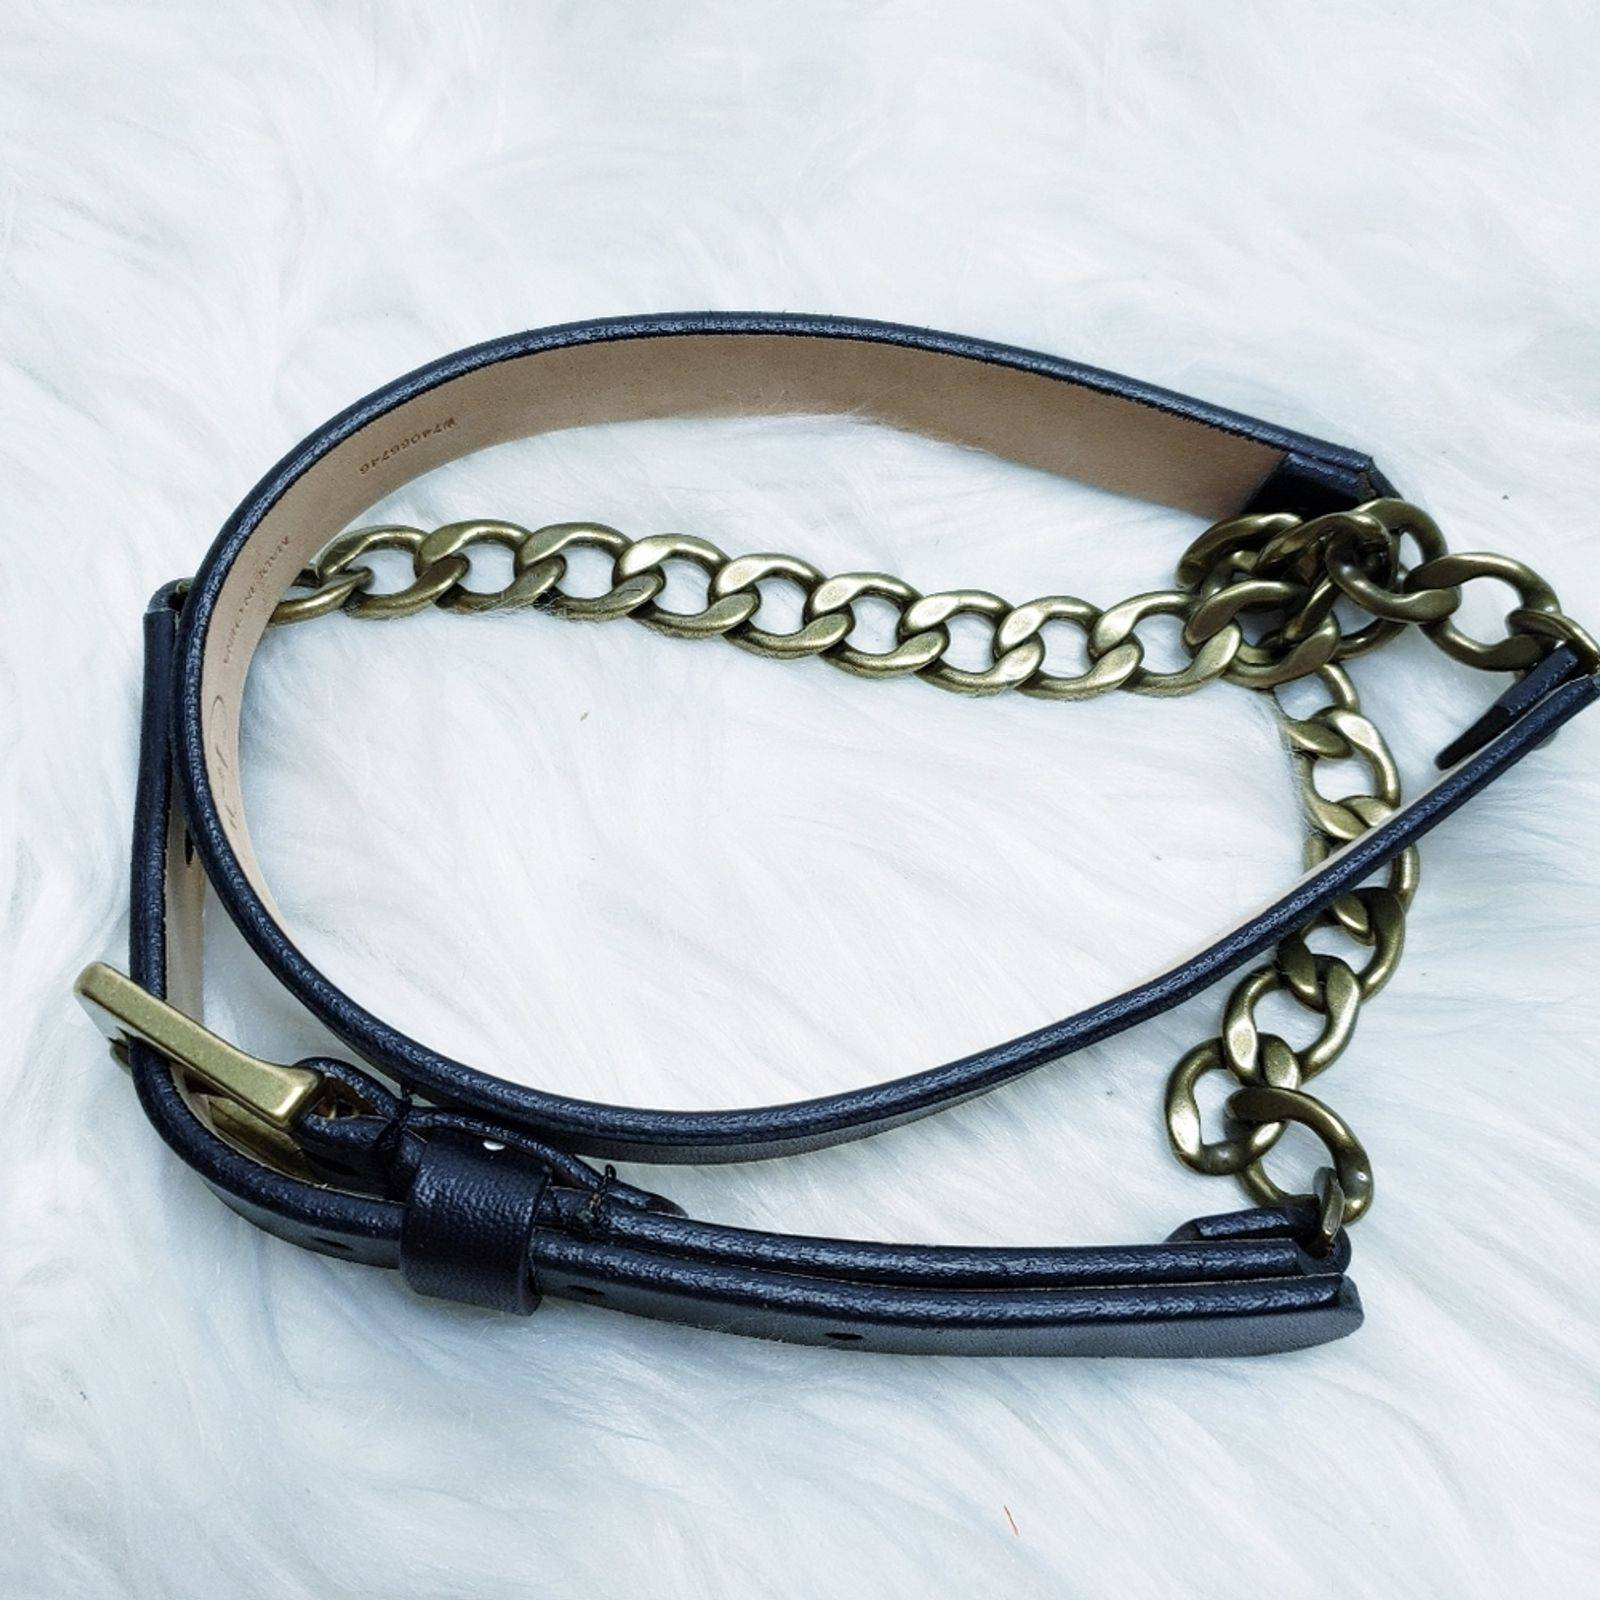 Talbots leather gold chain belt